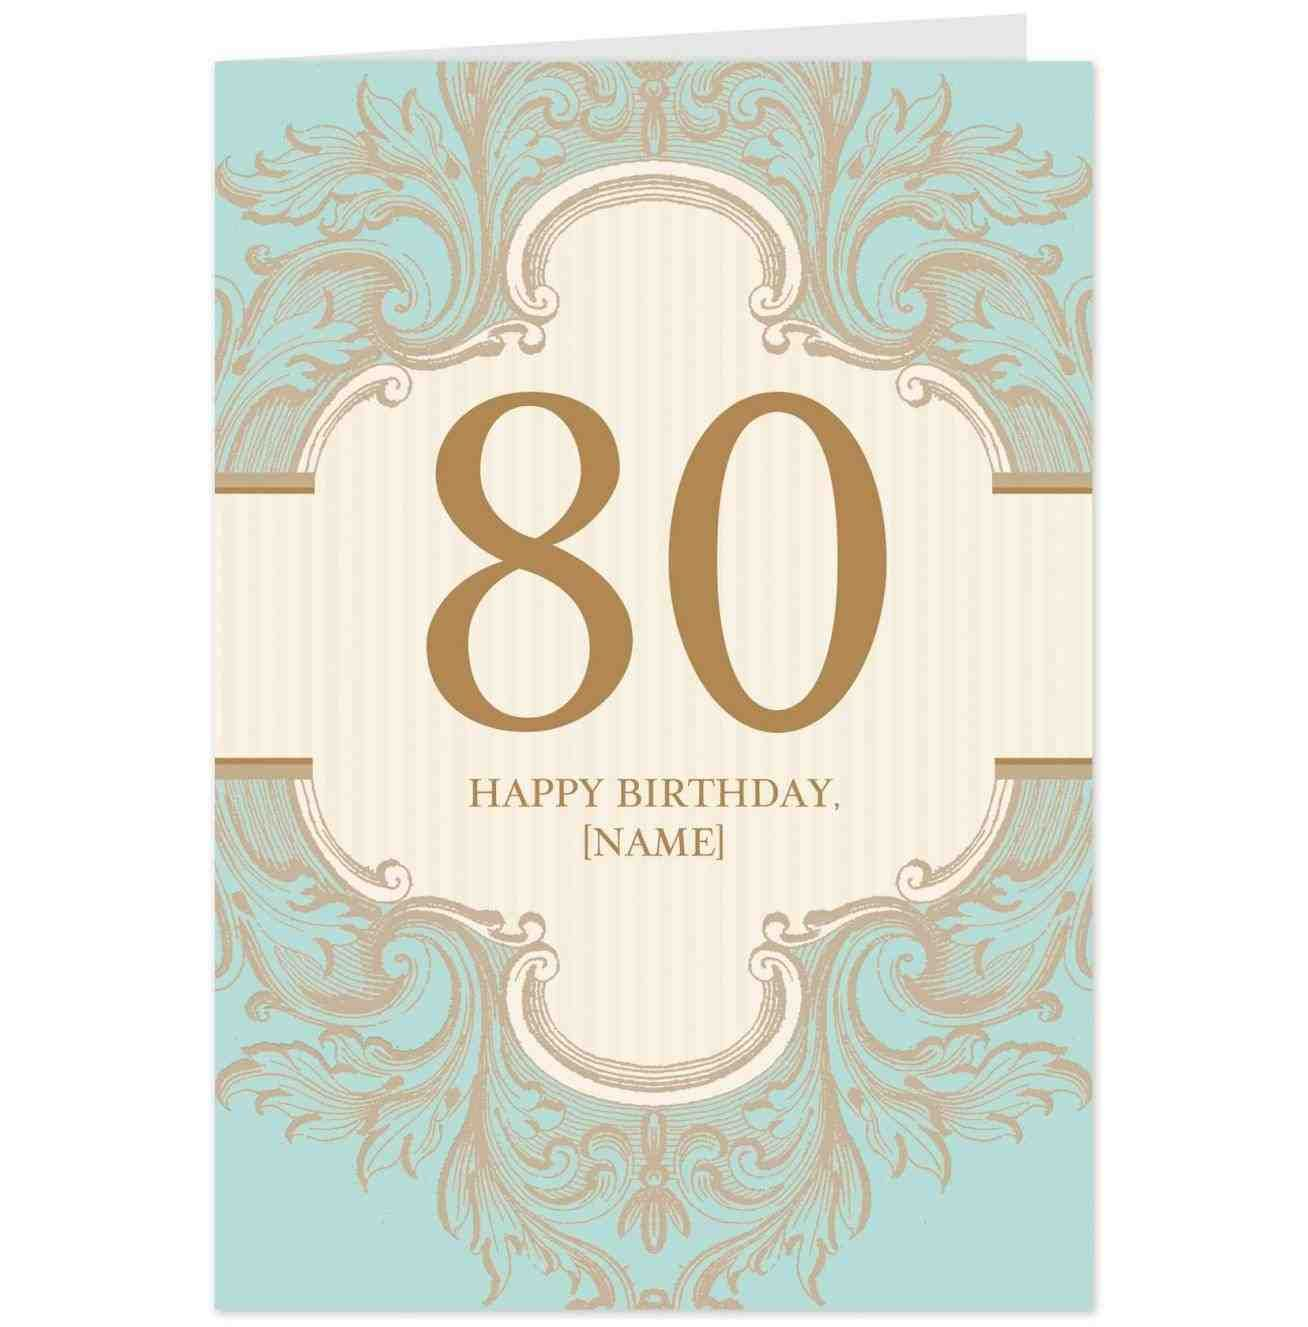 80th Birthday Card Box 80th Birthday Party Cards Memory Box 80 Years Anniversary Birthday Card Set Mum S 80th Birthday Bookatrix Card 80 S Birthday Card